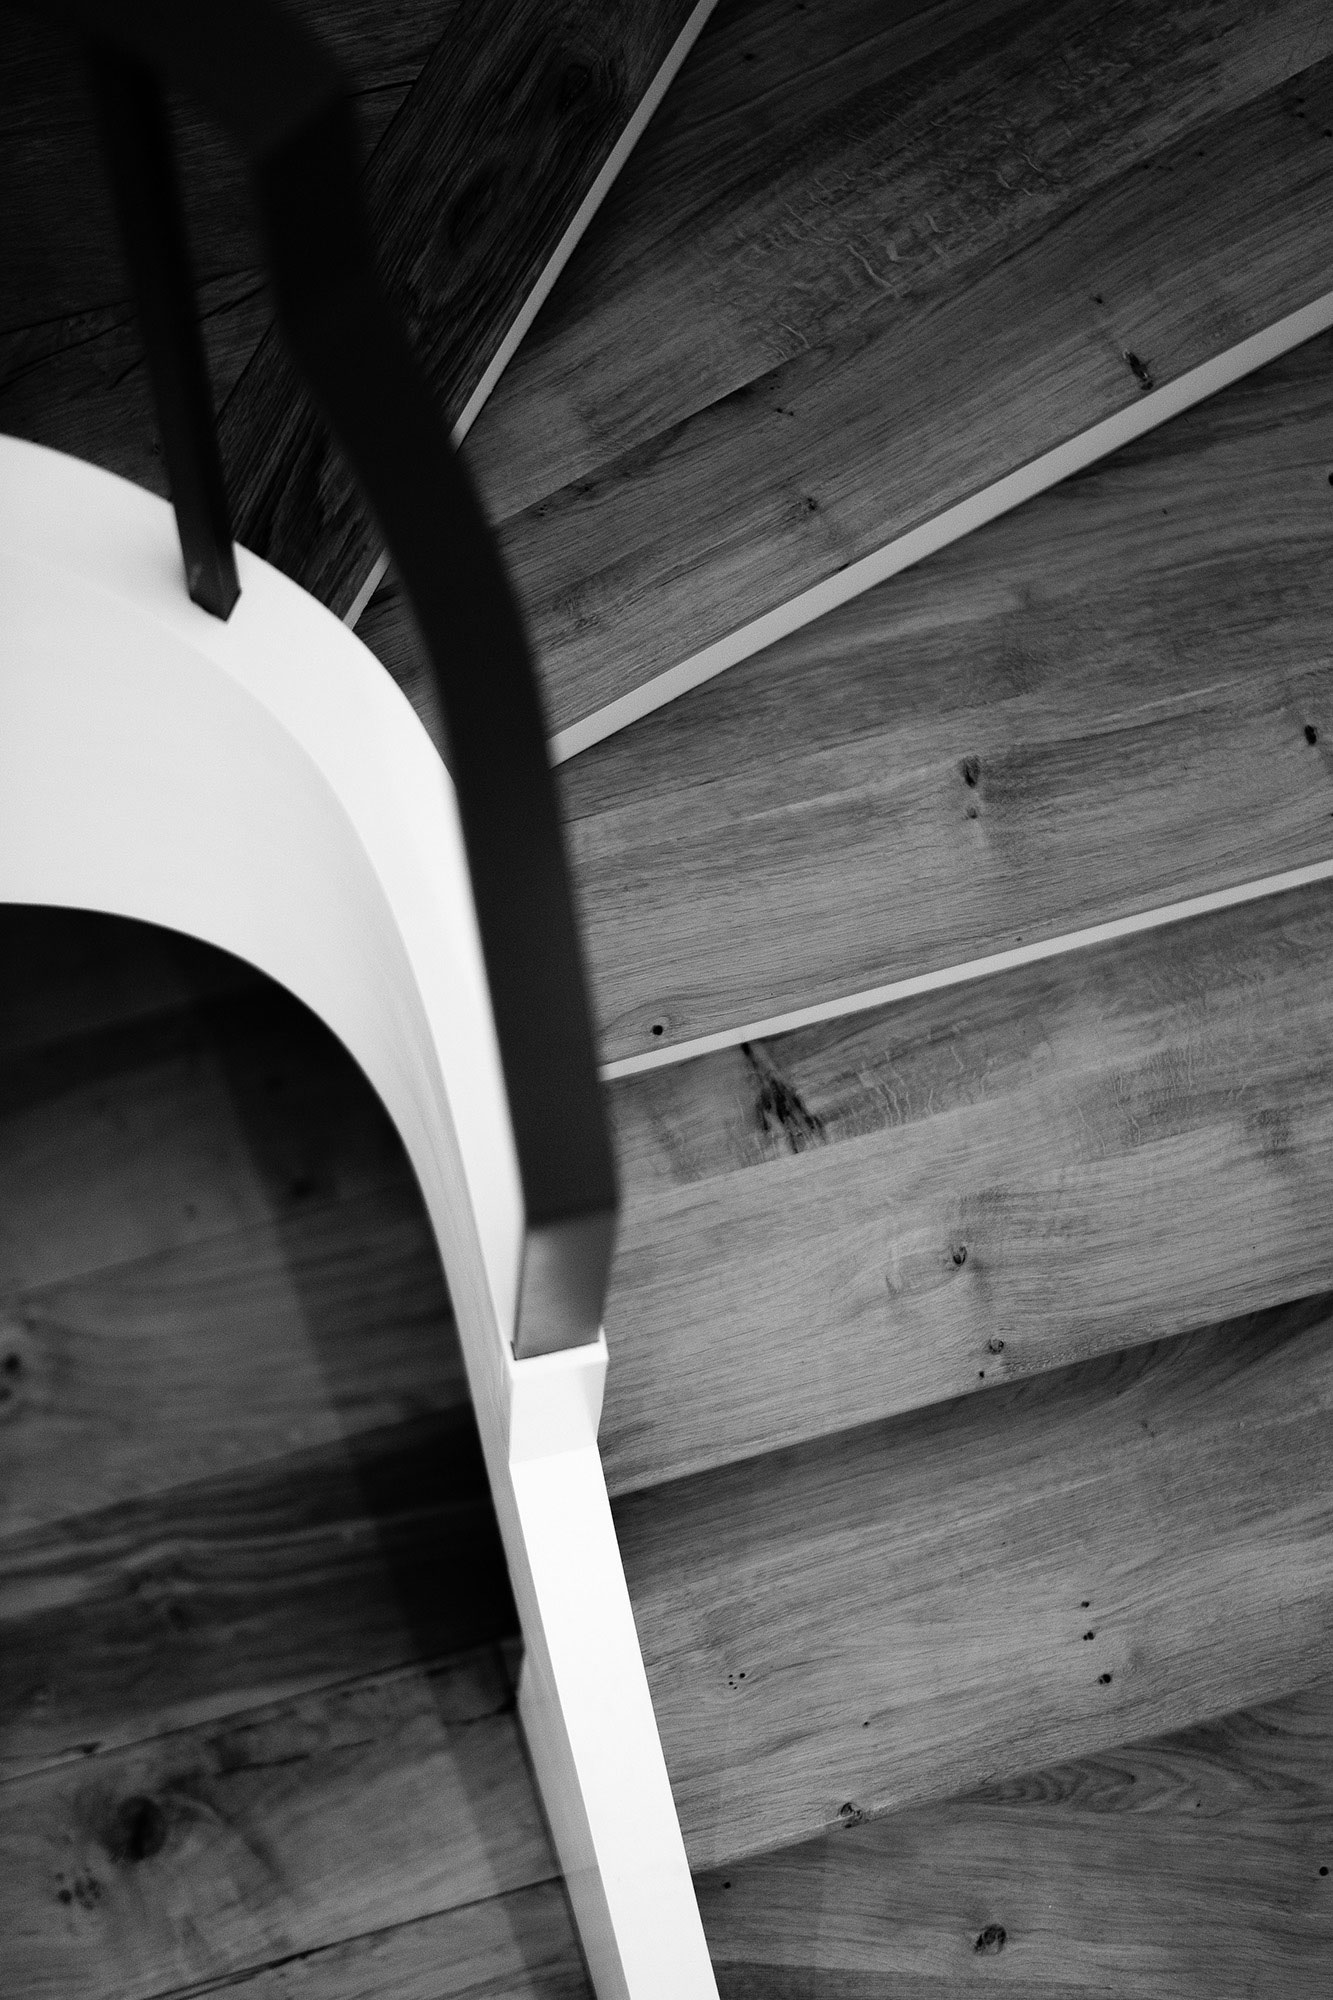 Alex+Accleton+Staircase+Joinery+2017+Matty+Snelling+02.jpg